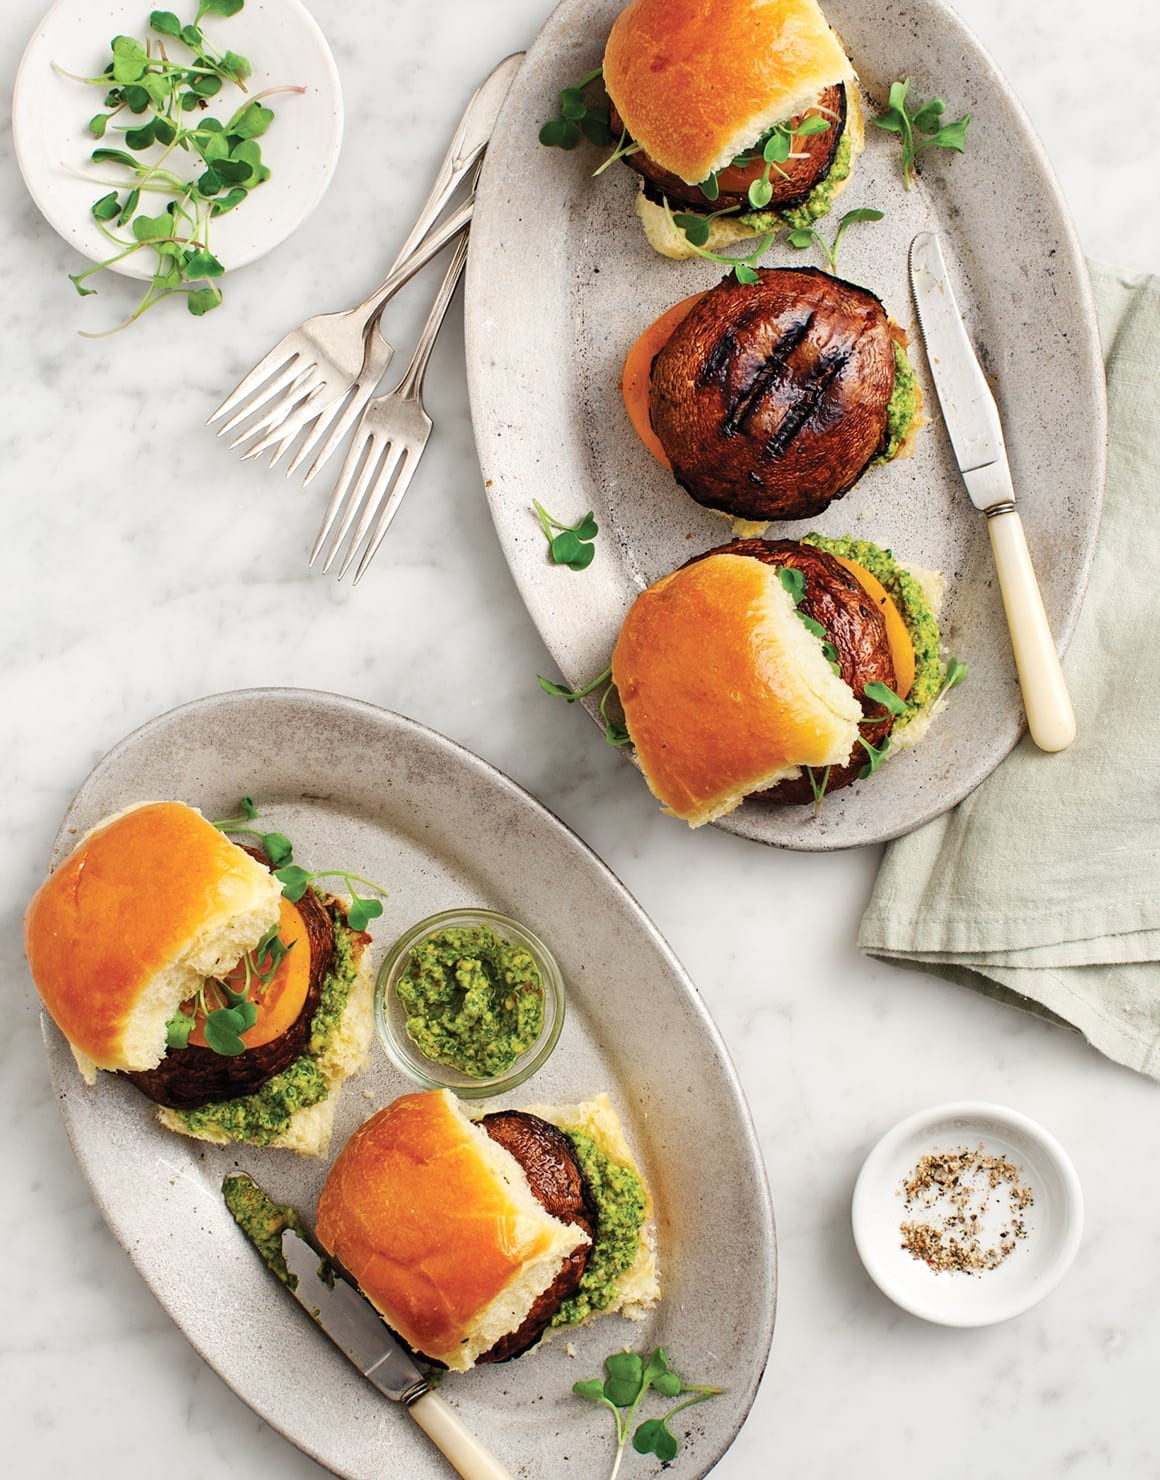 Vegetarian Bbq Recipes  Ve arian & Vegan Grilling Recipes Love and Lemons